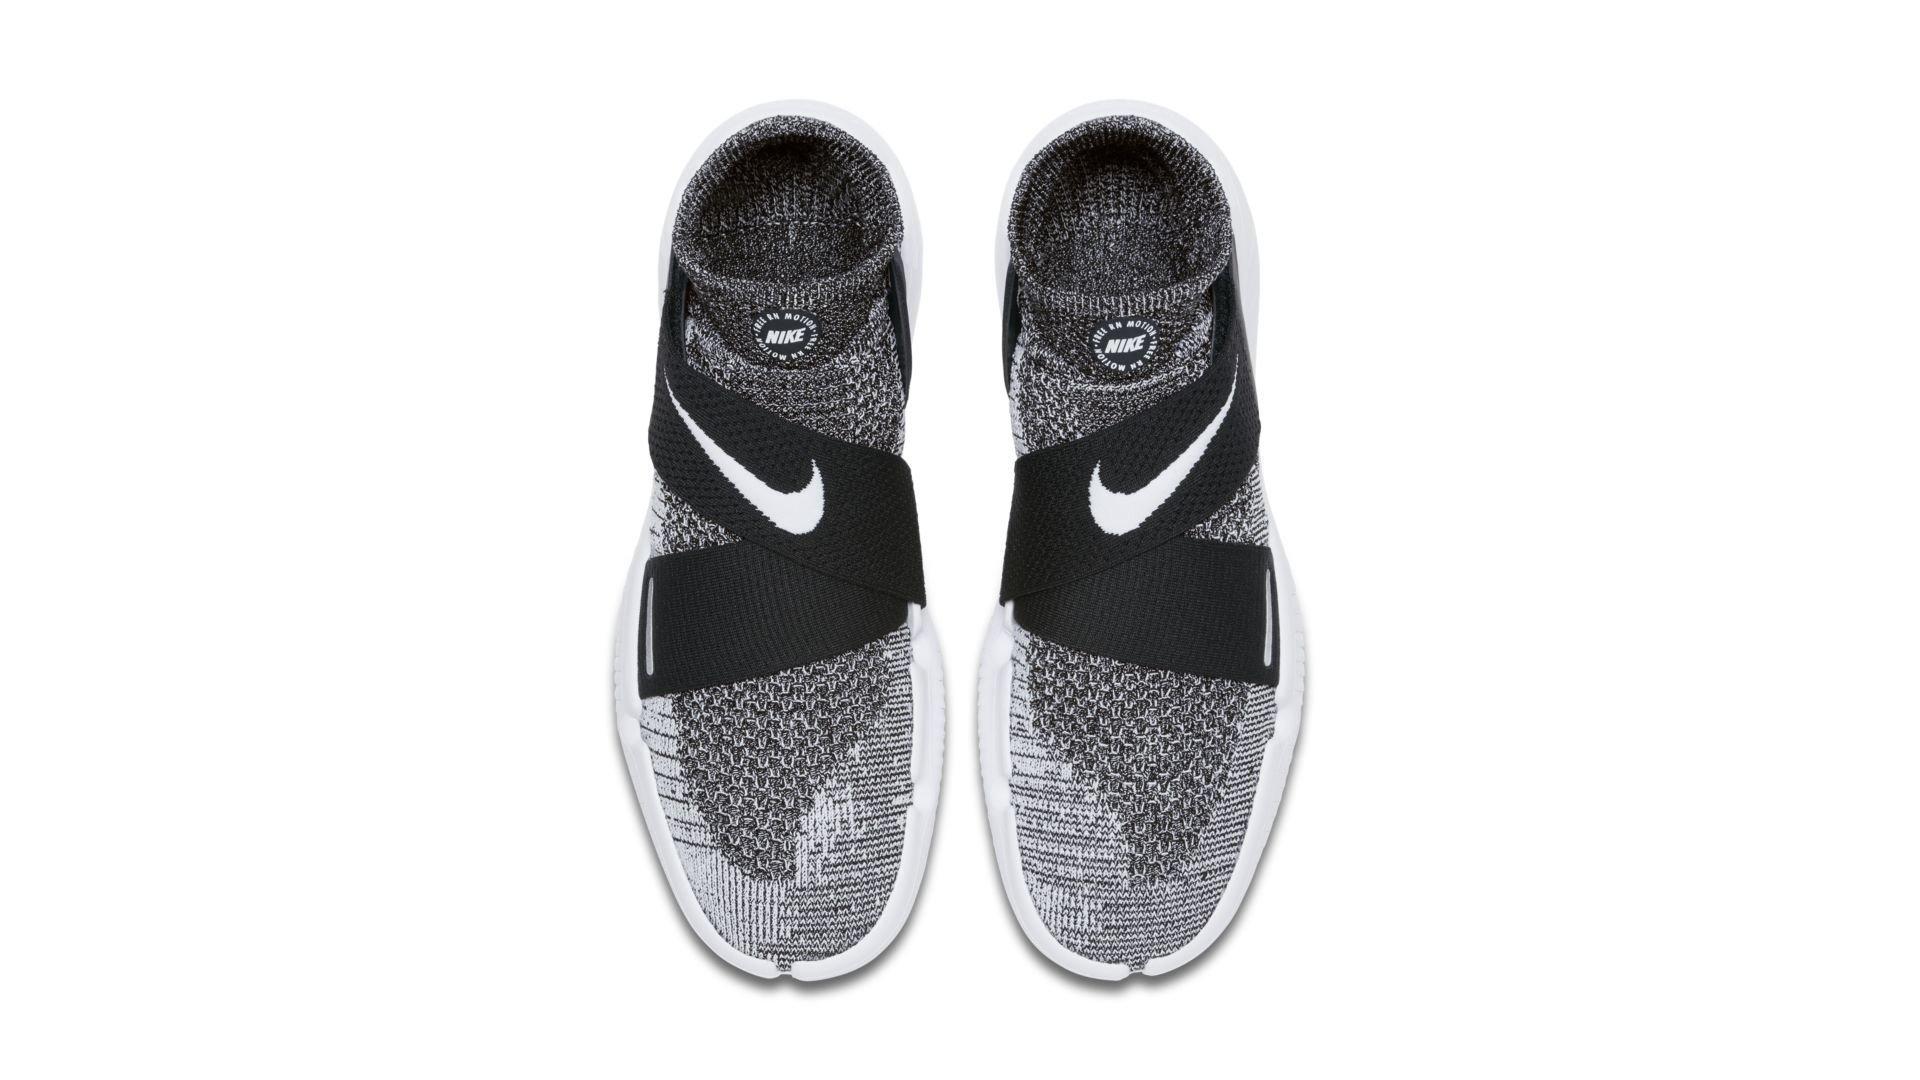 Nike Free RN Motion Flyknit 2018 Oreo (942840-001)